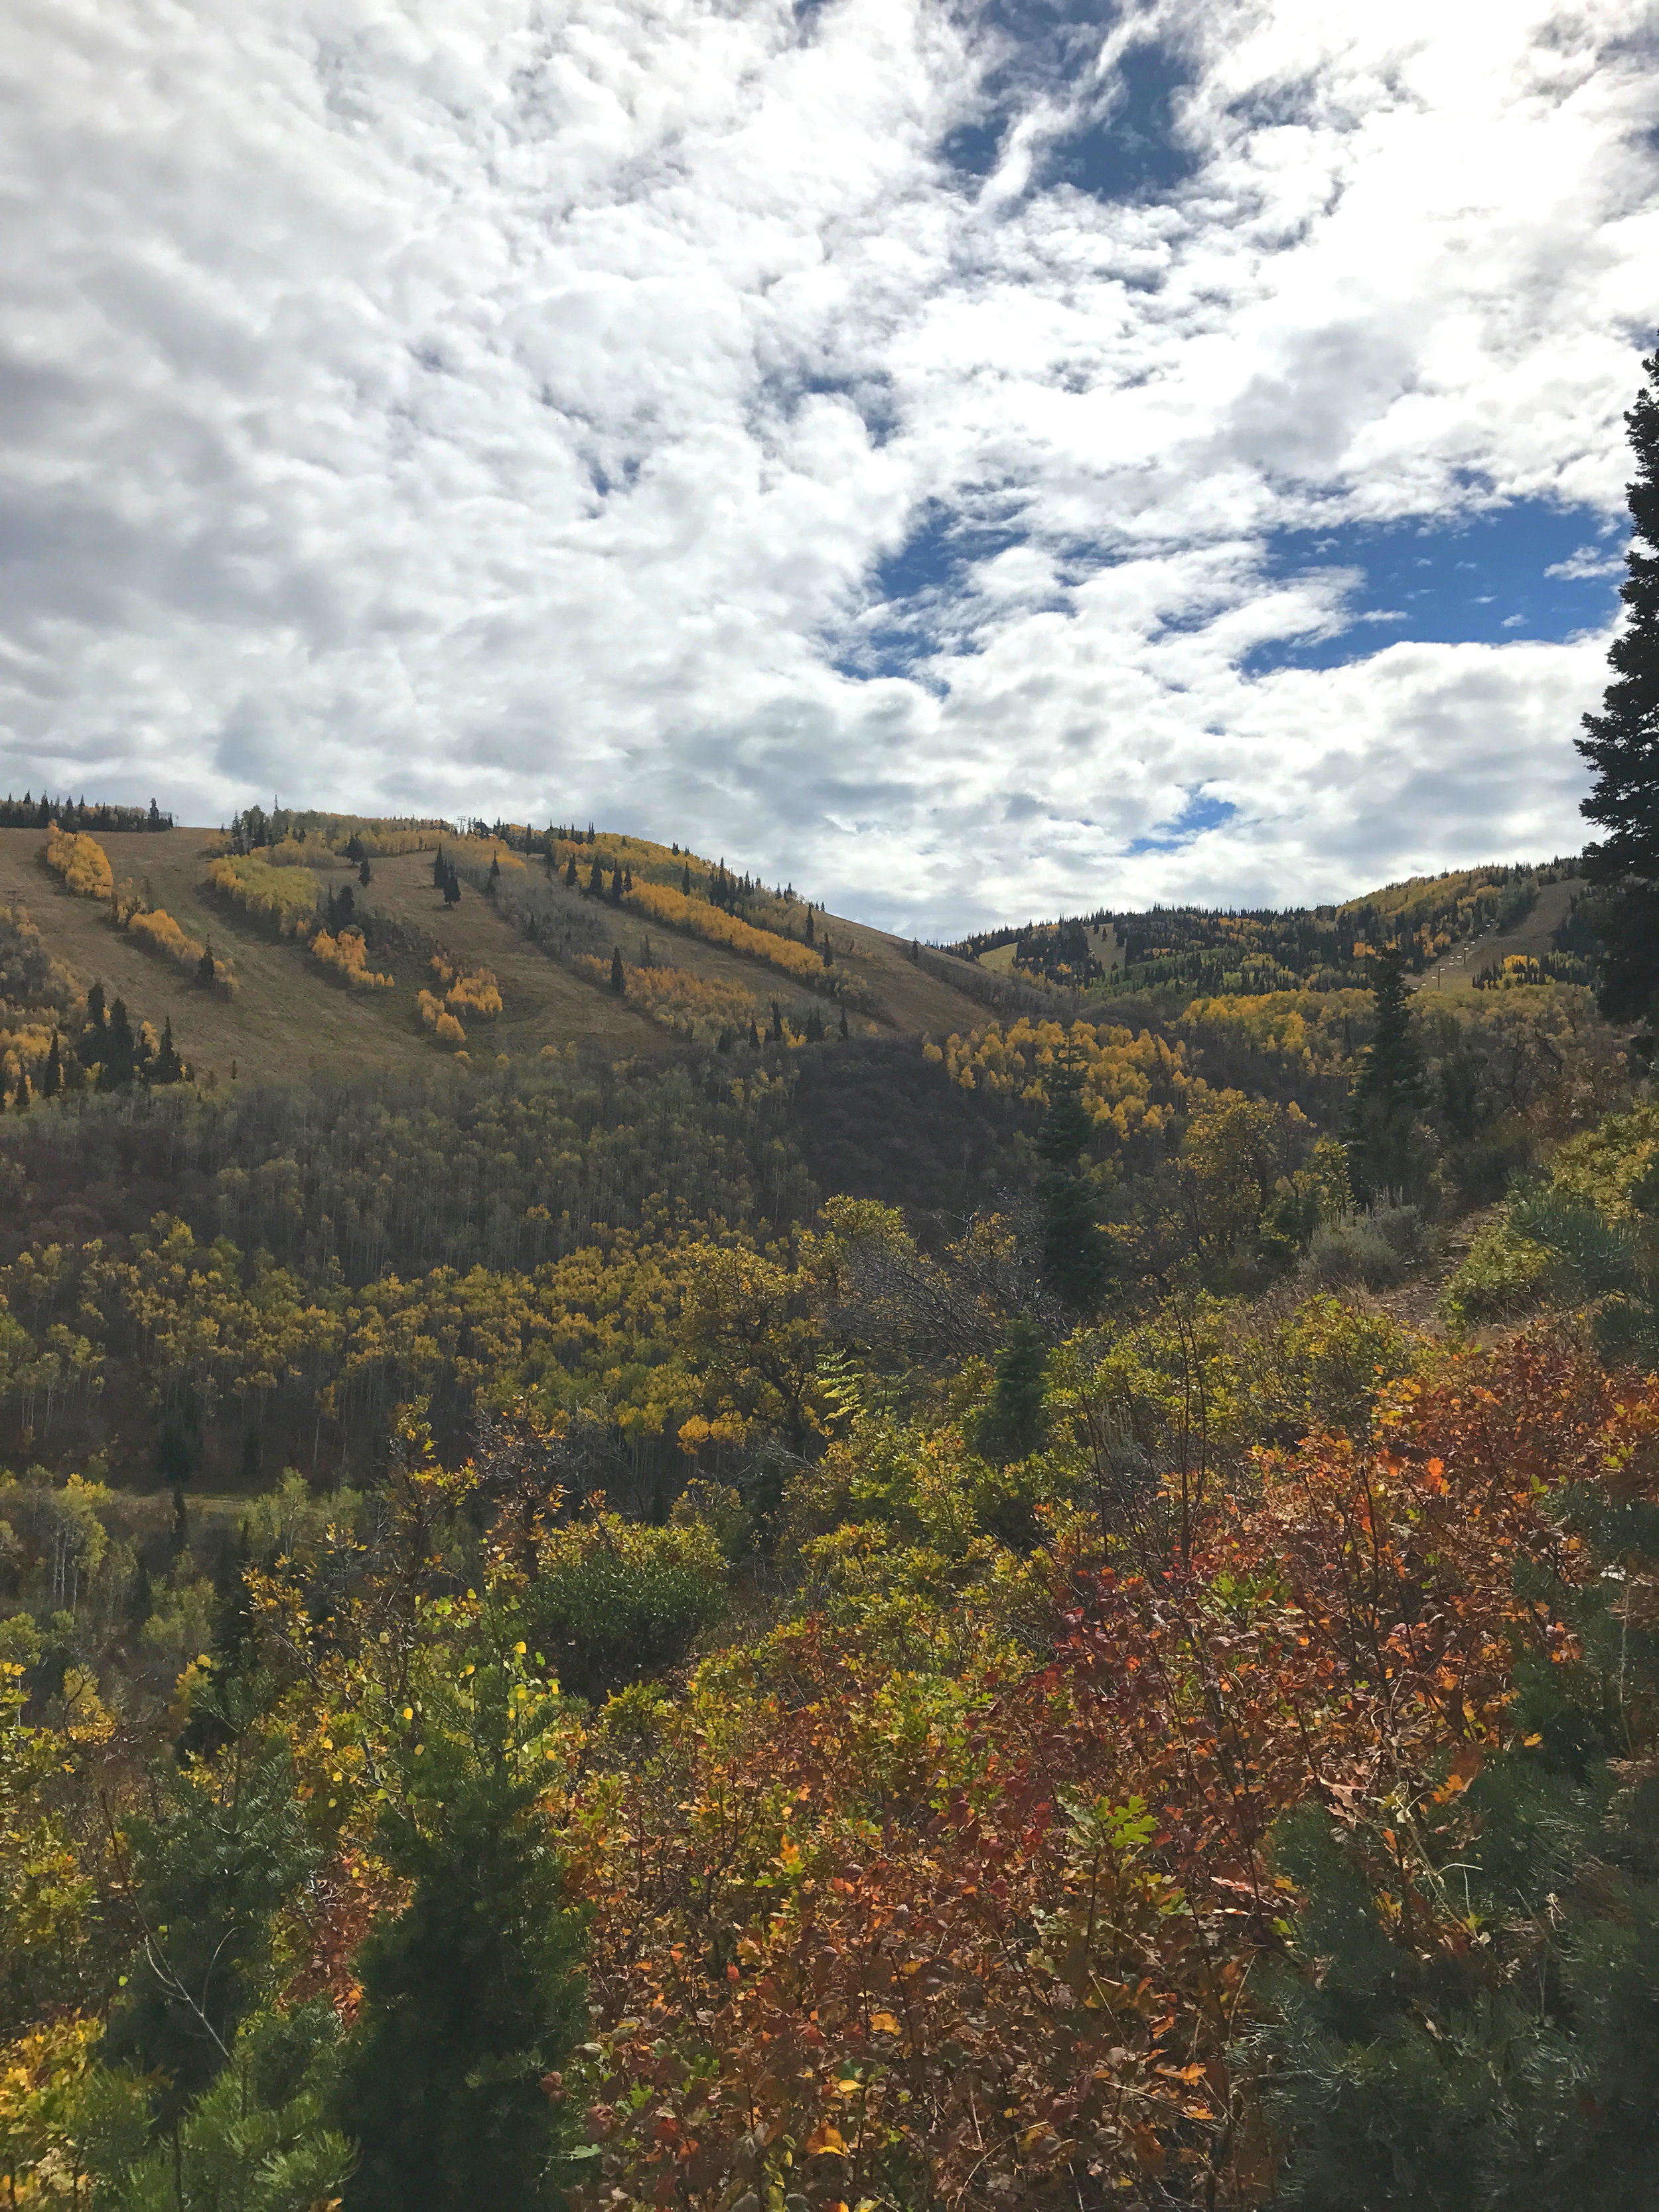 Fall foliage in Park City, Utah